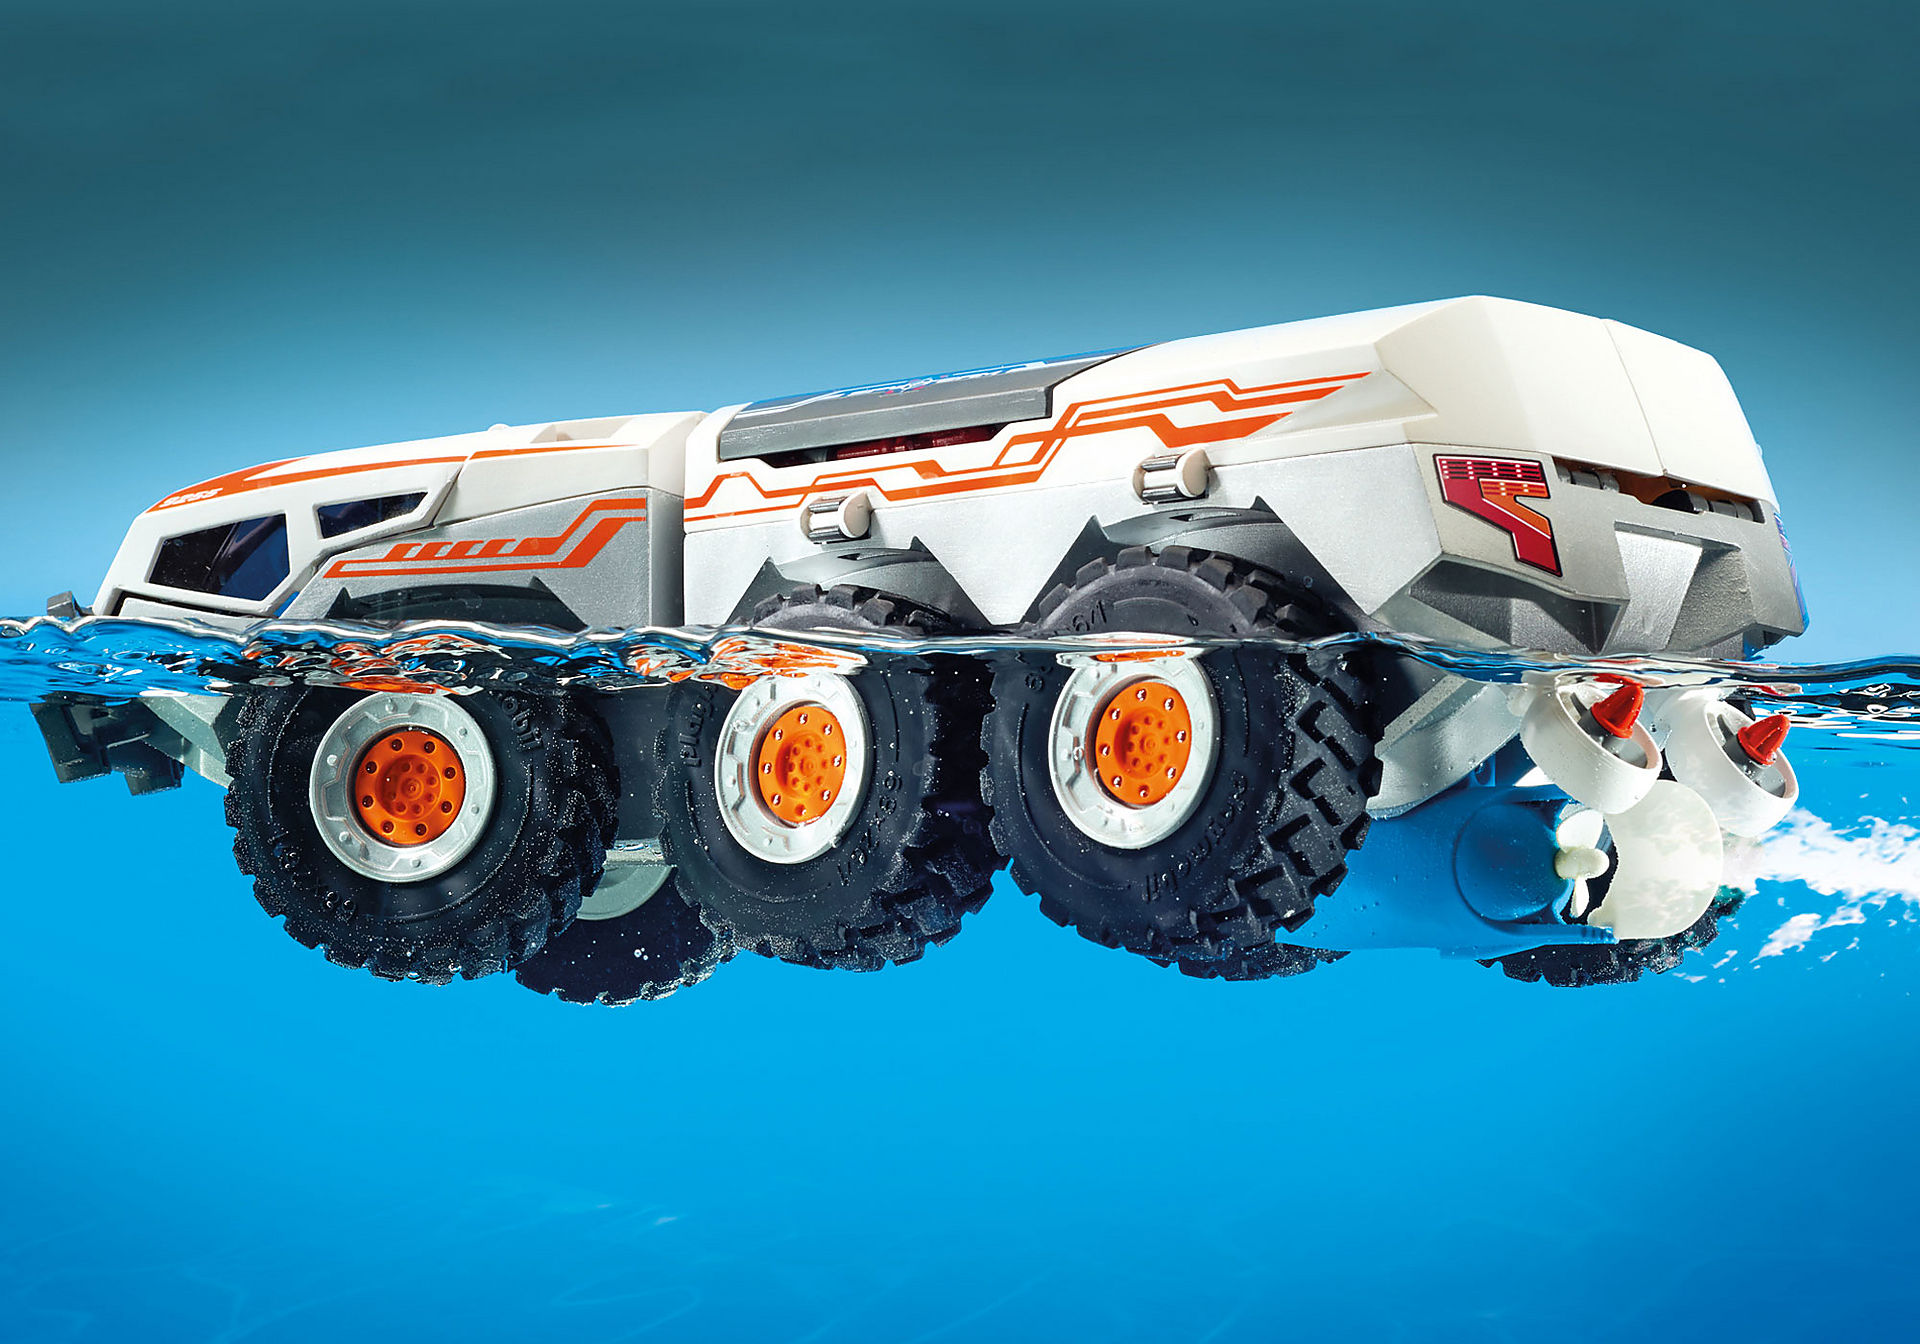 http://media.playmobil.com/i/playmobil/9255_product_extra2/SpyTeam Battle Truck